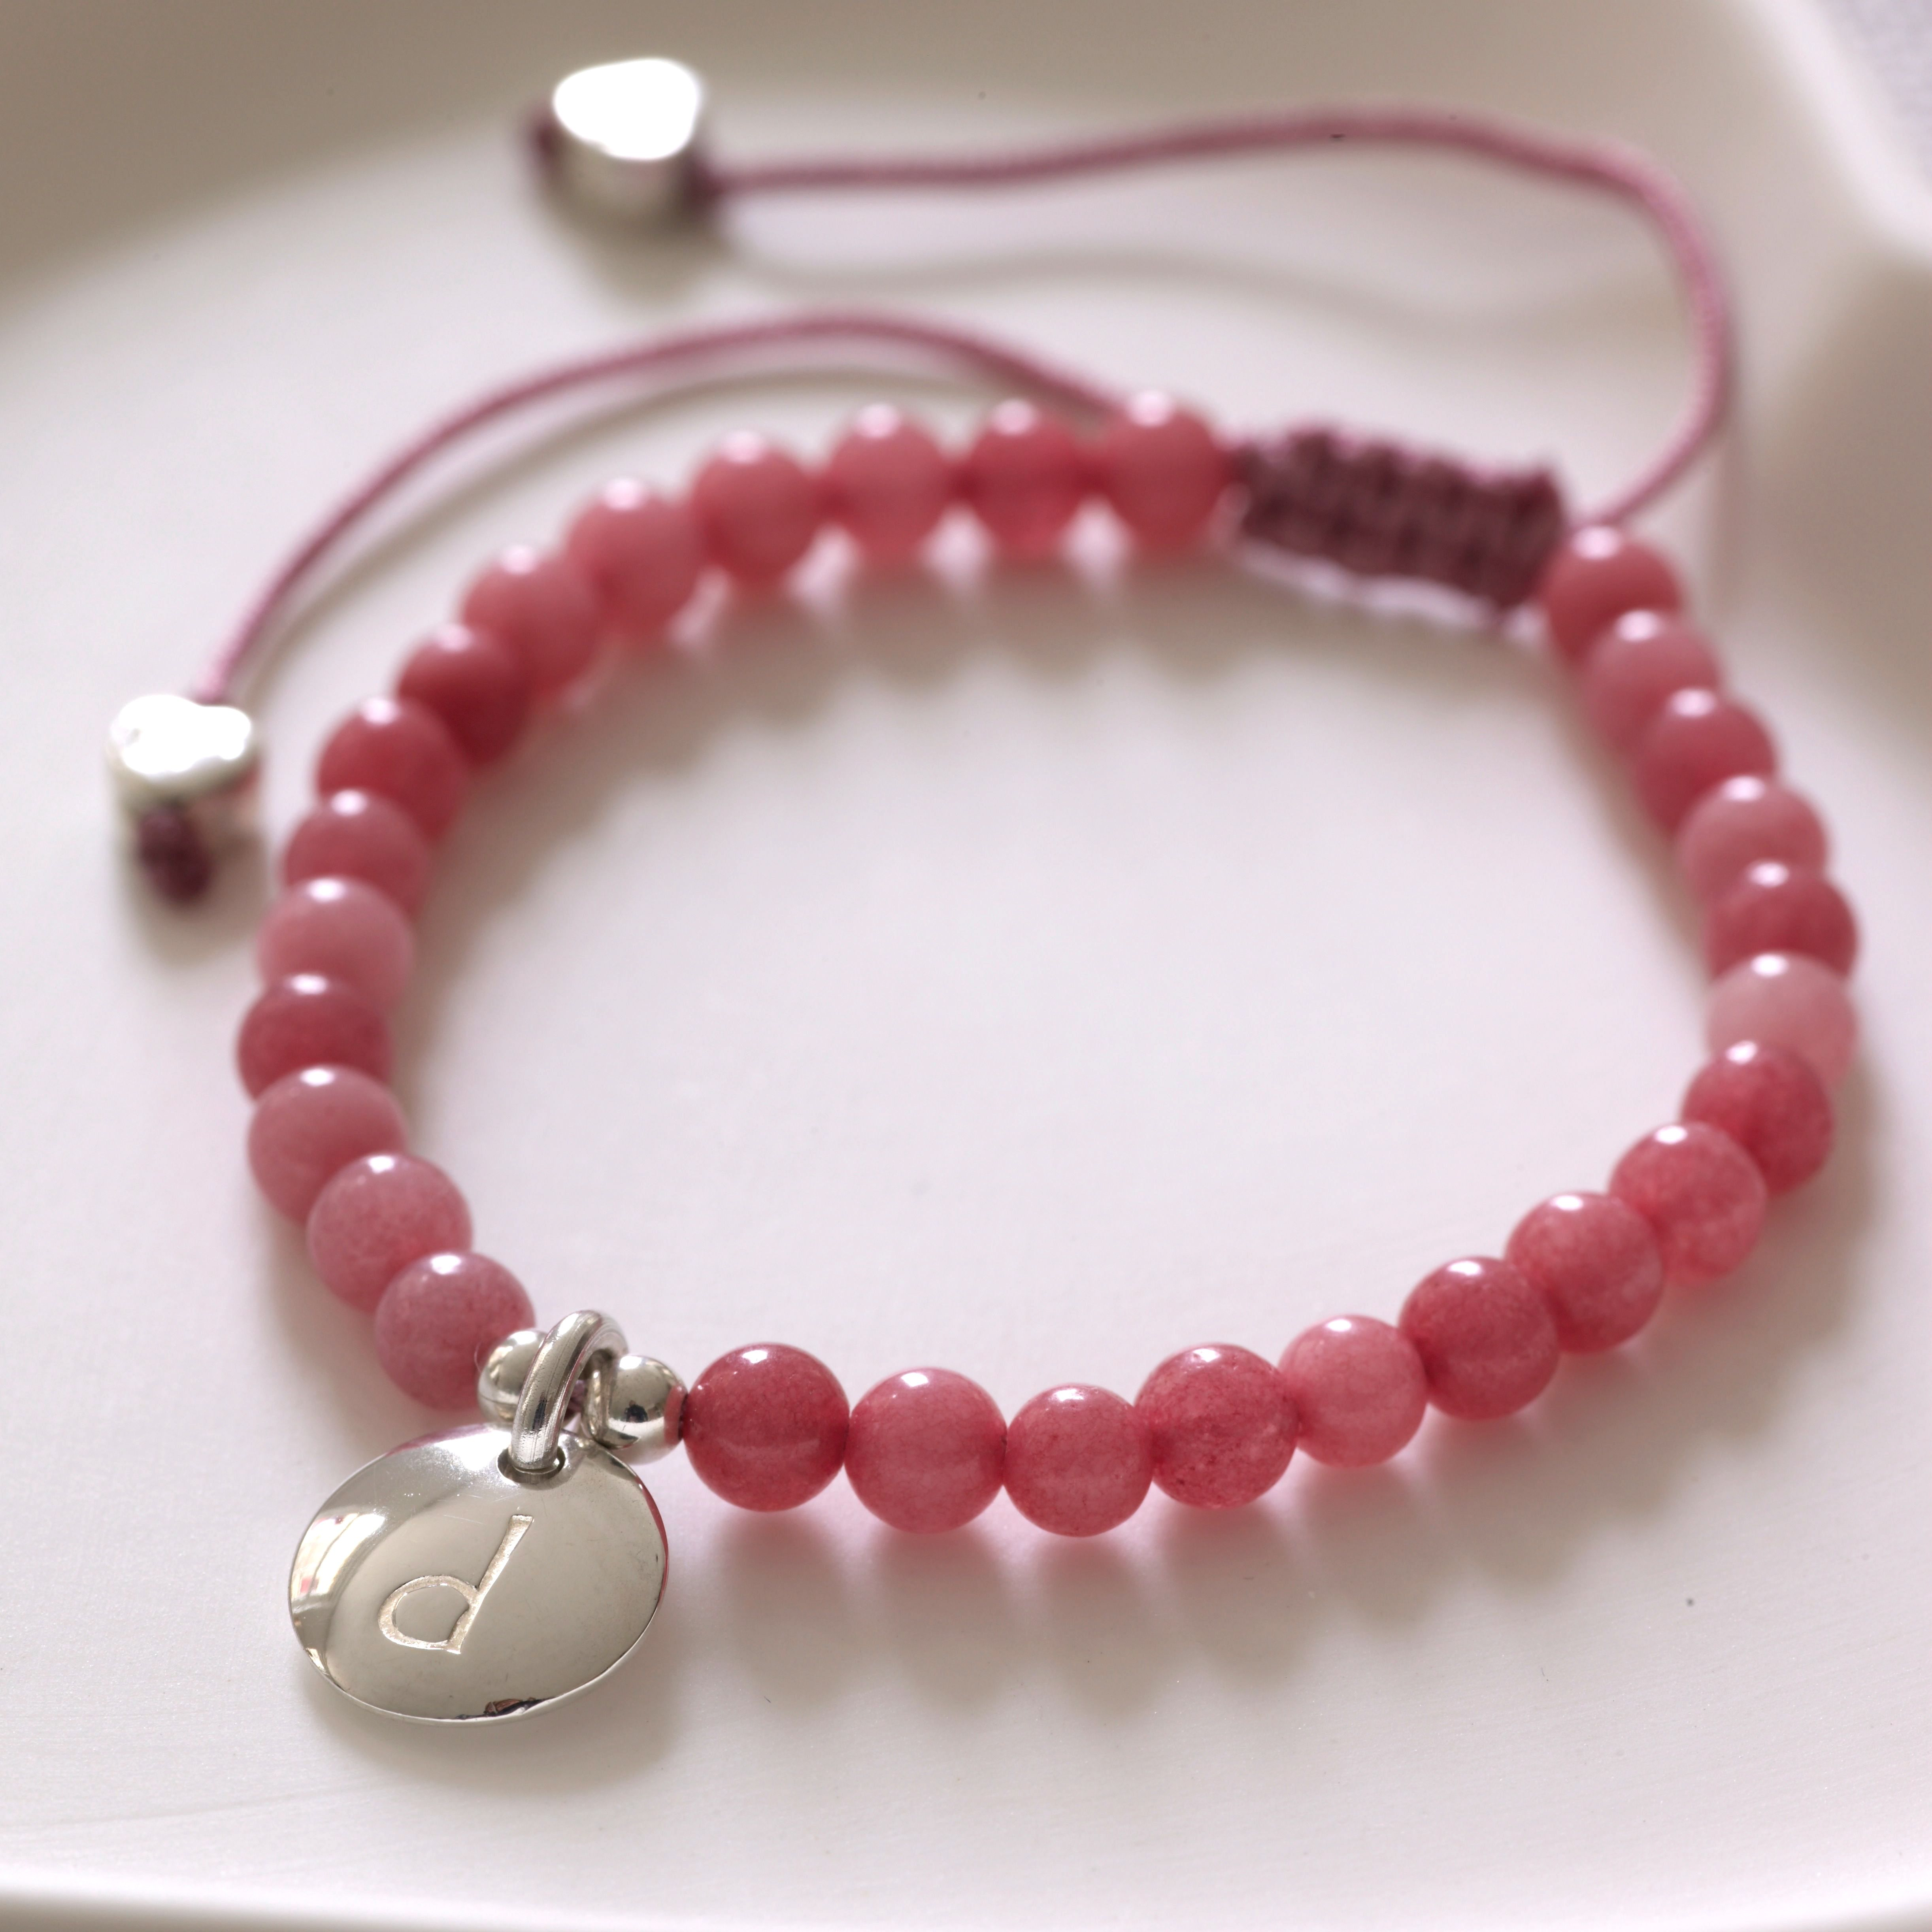 Lily belle girls personalised pink quartz friendship bracelet